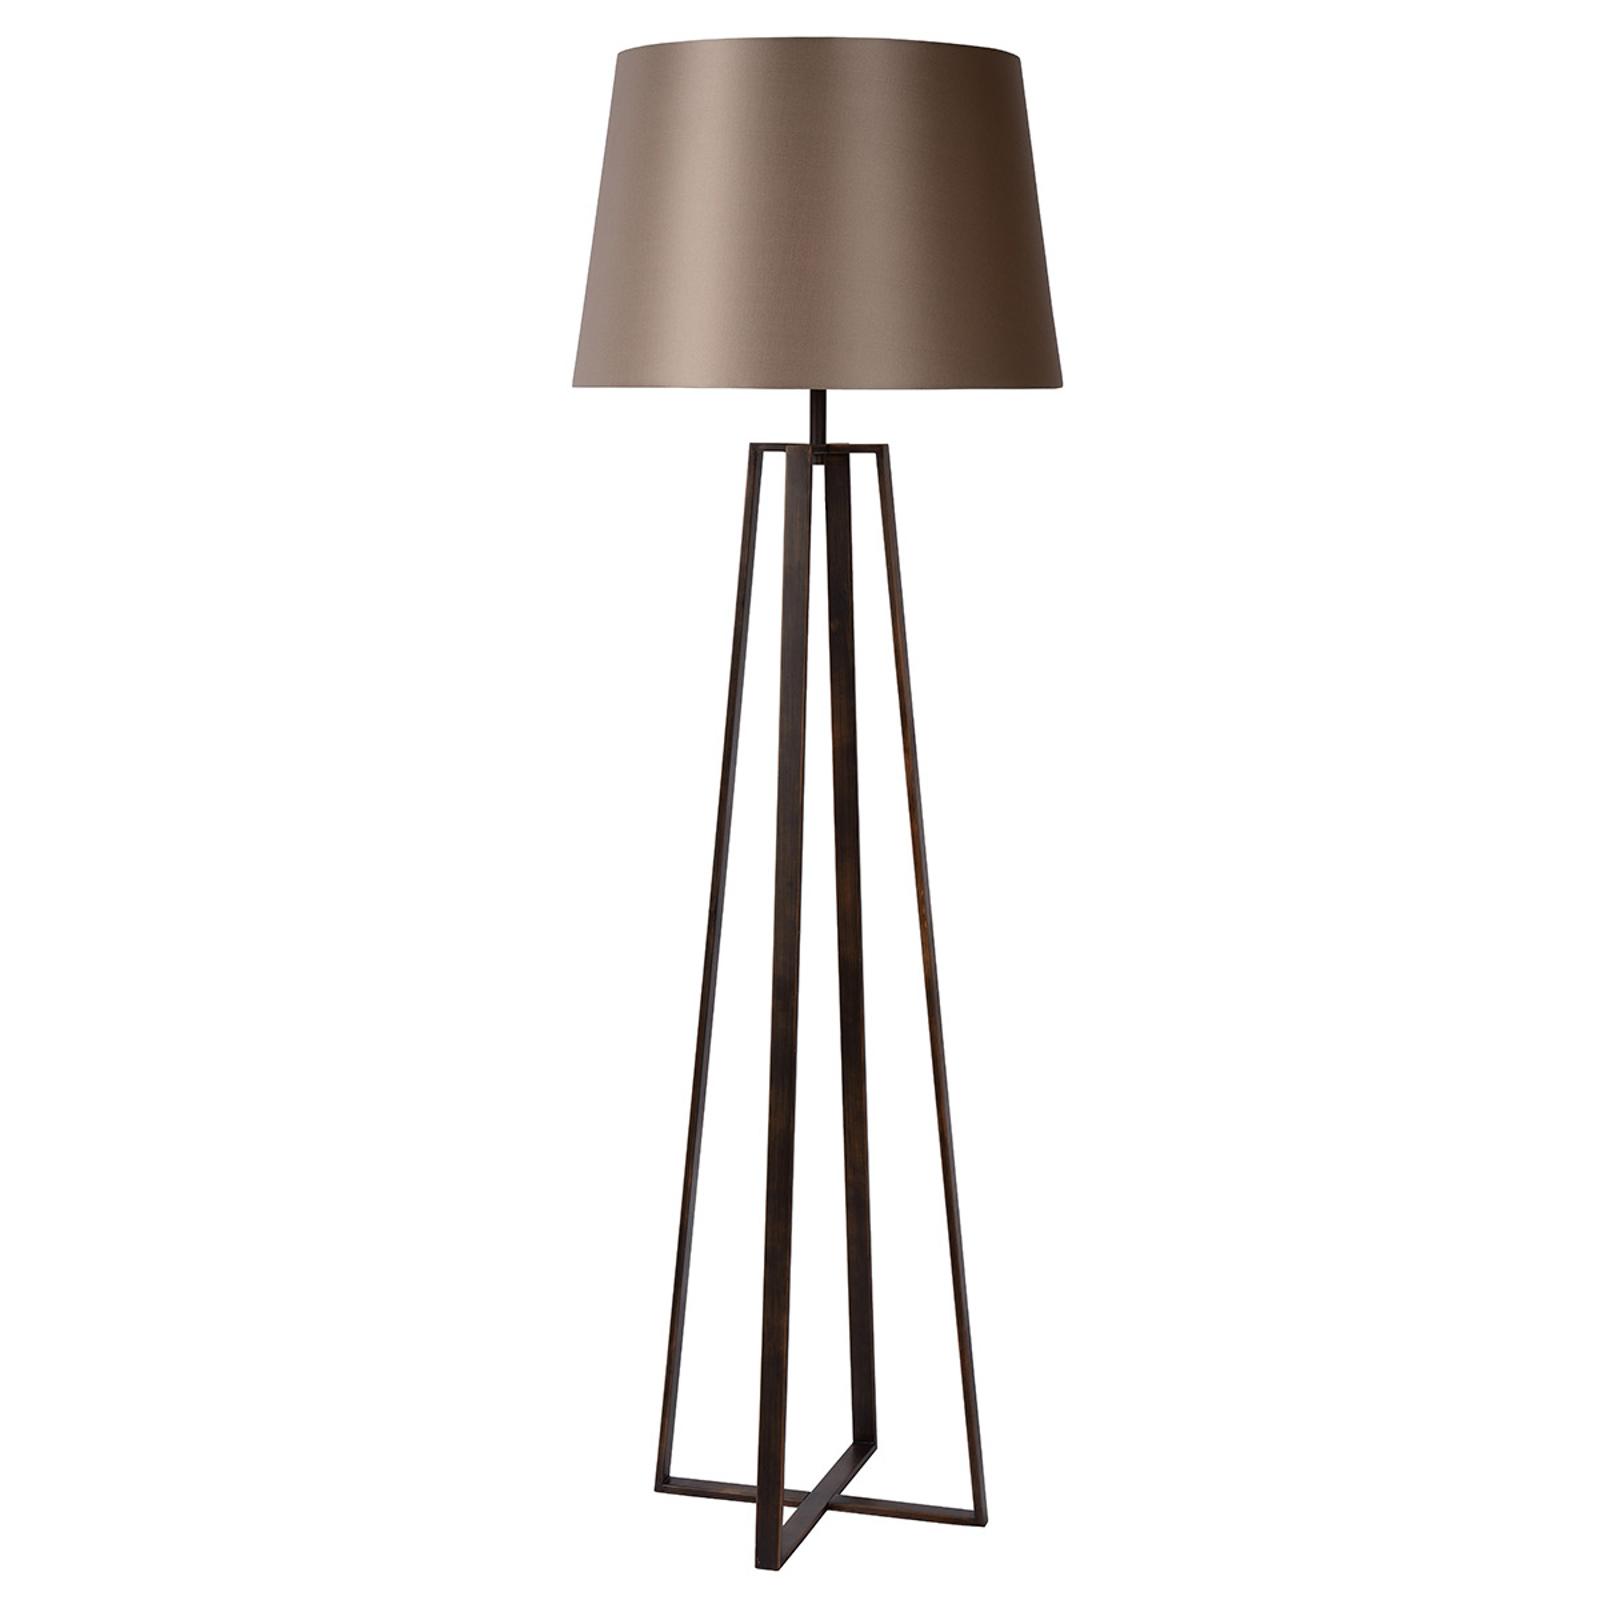 Lampada da terra ruggine Coffee Lamp, tessuto